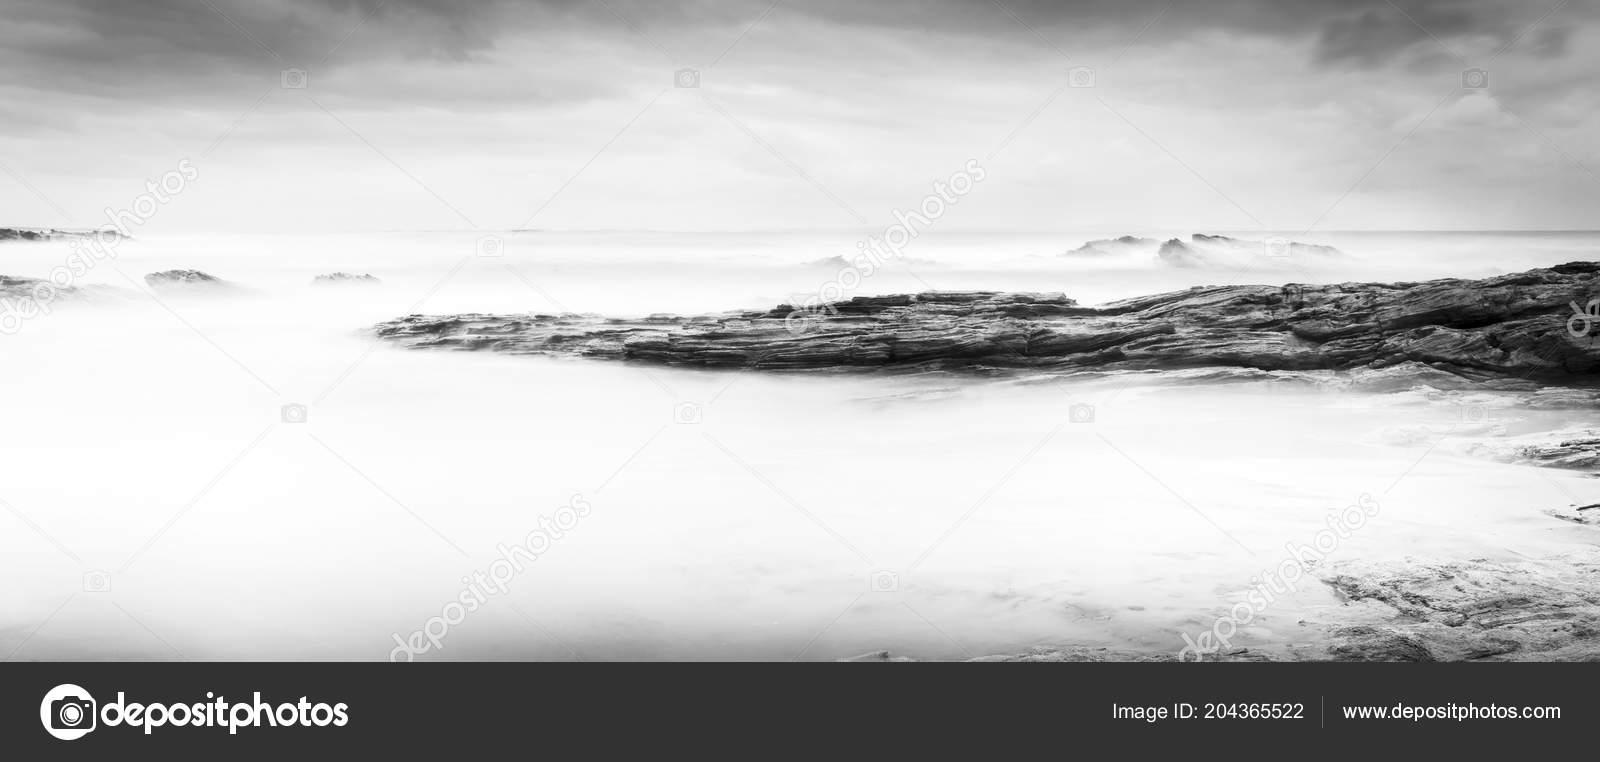 Calm Ocean Landscape Time Lapse Smooth Waves Rocks Black